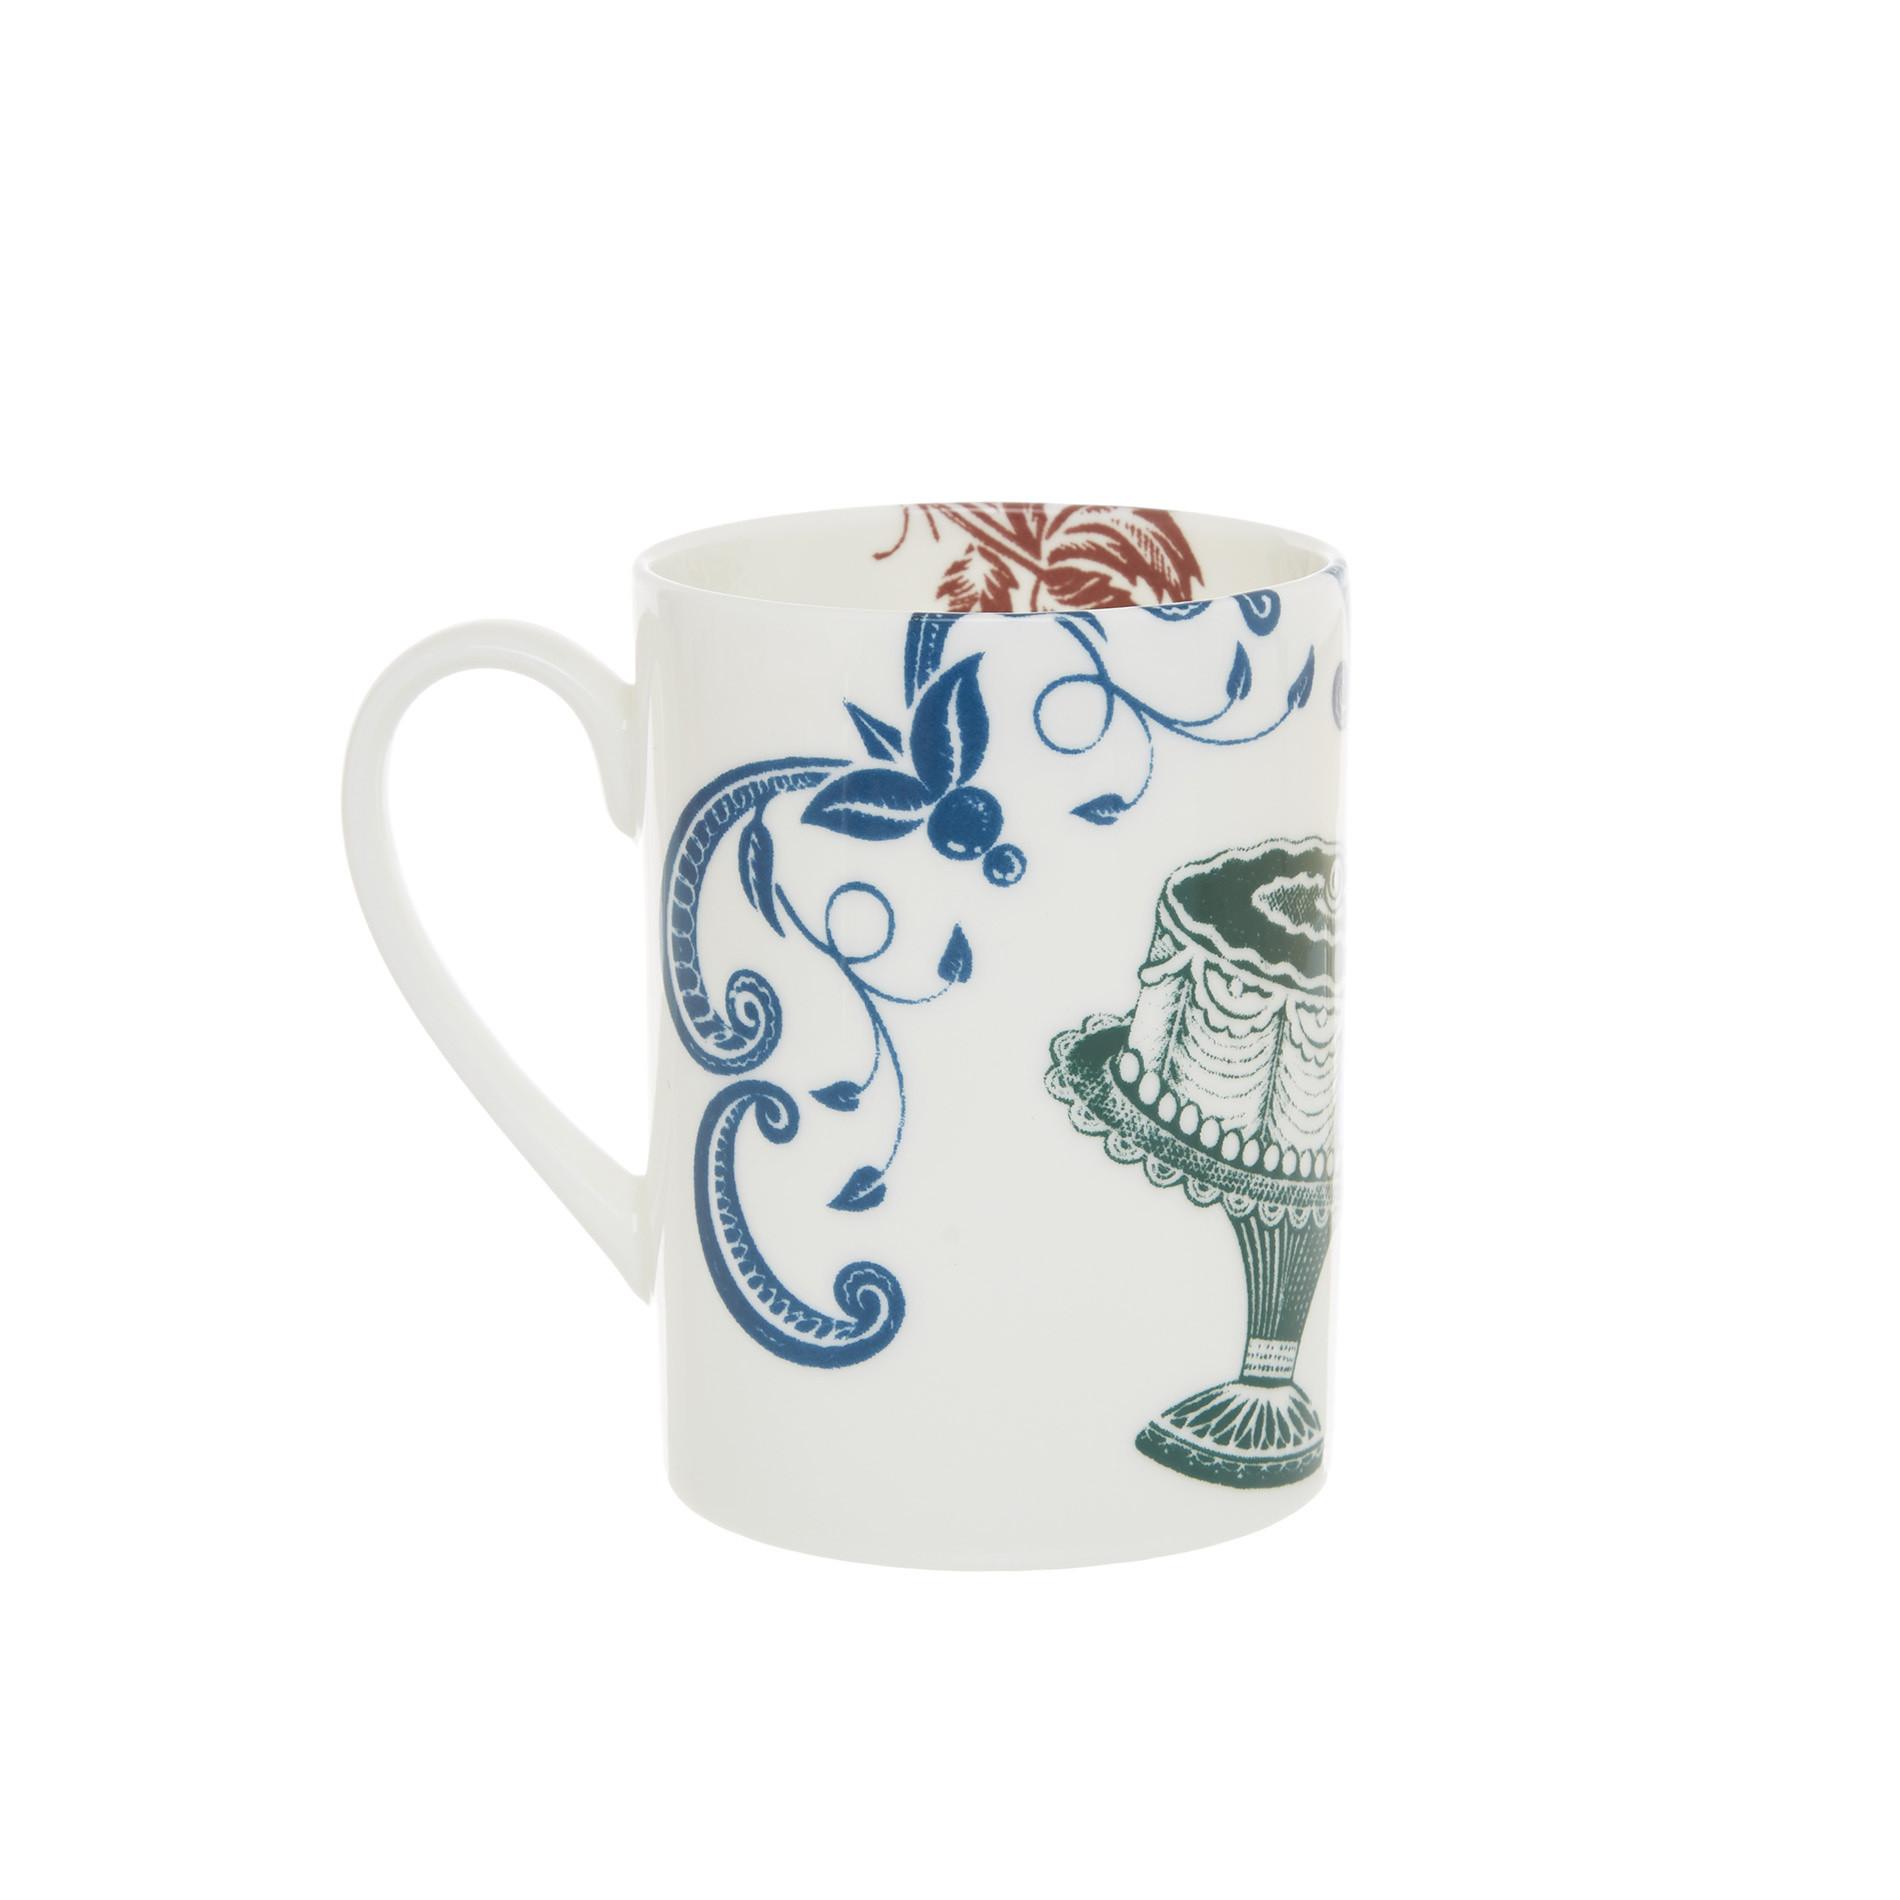 Mug fine bone china decoro vintage La Cucina Italiana, Bianco, large image number 1